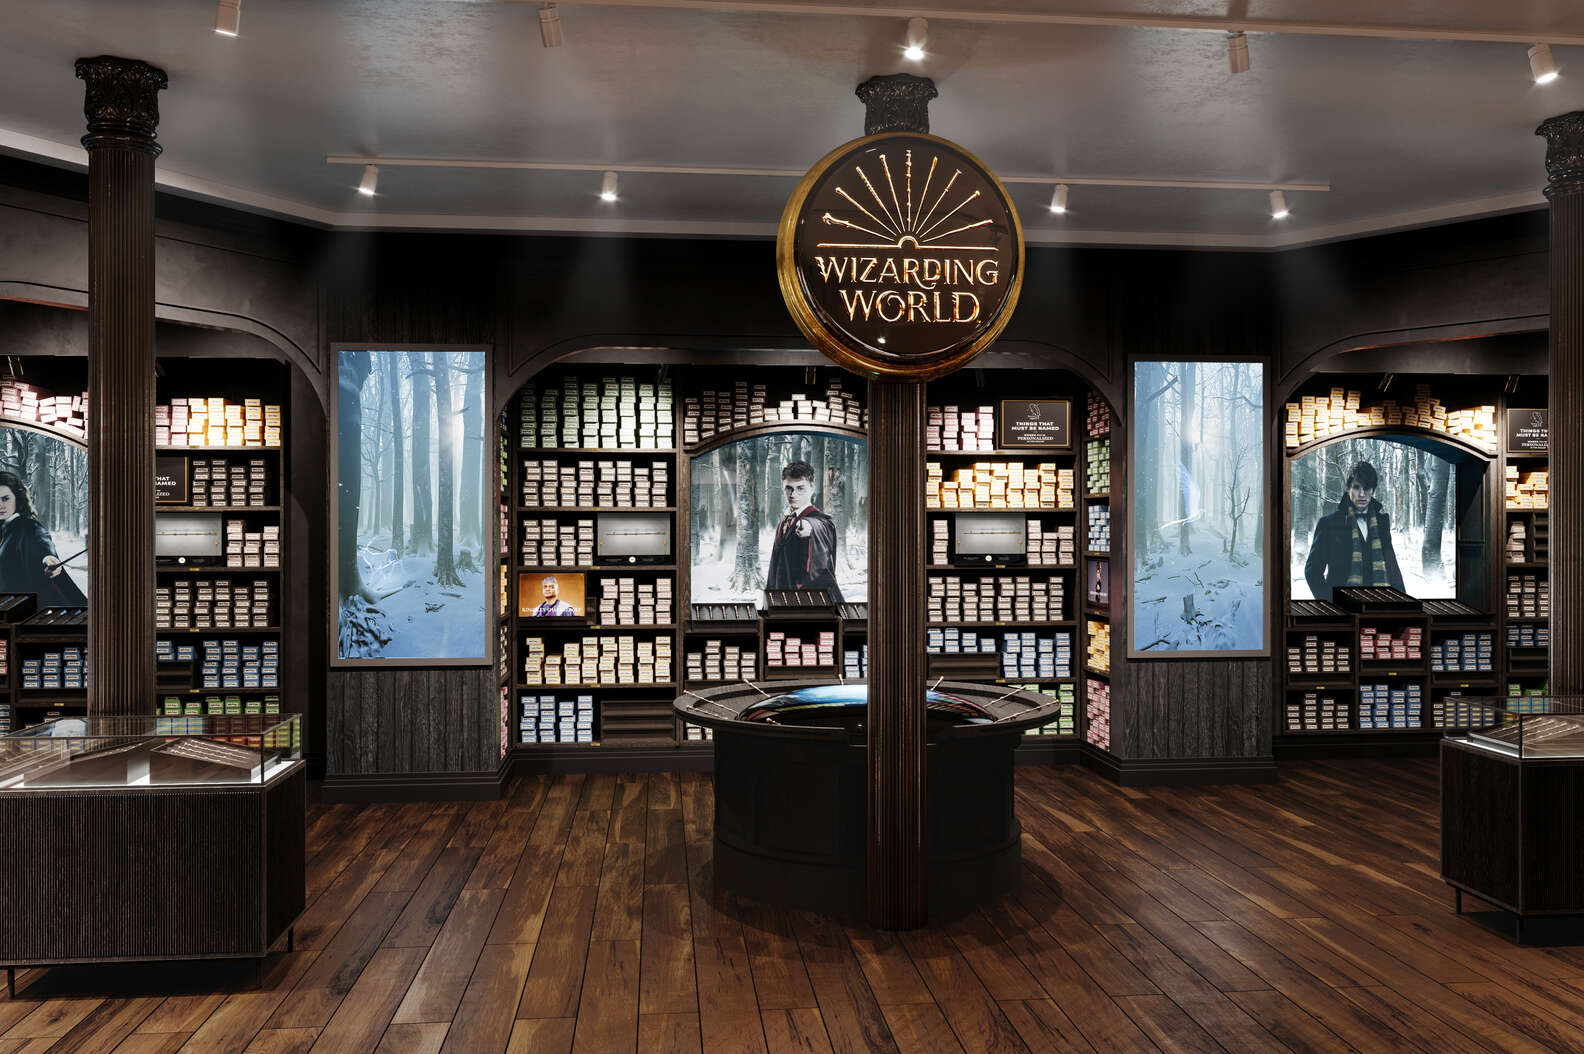 To μεγαλύτερο κατάστημα Harry Potter ανοίγει στη Νέα Υόρκη!